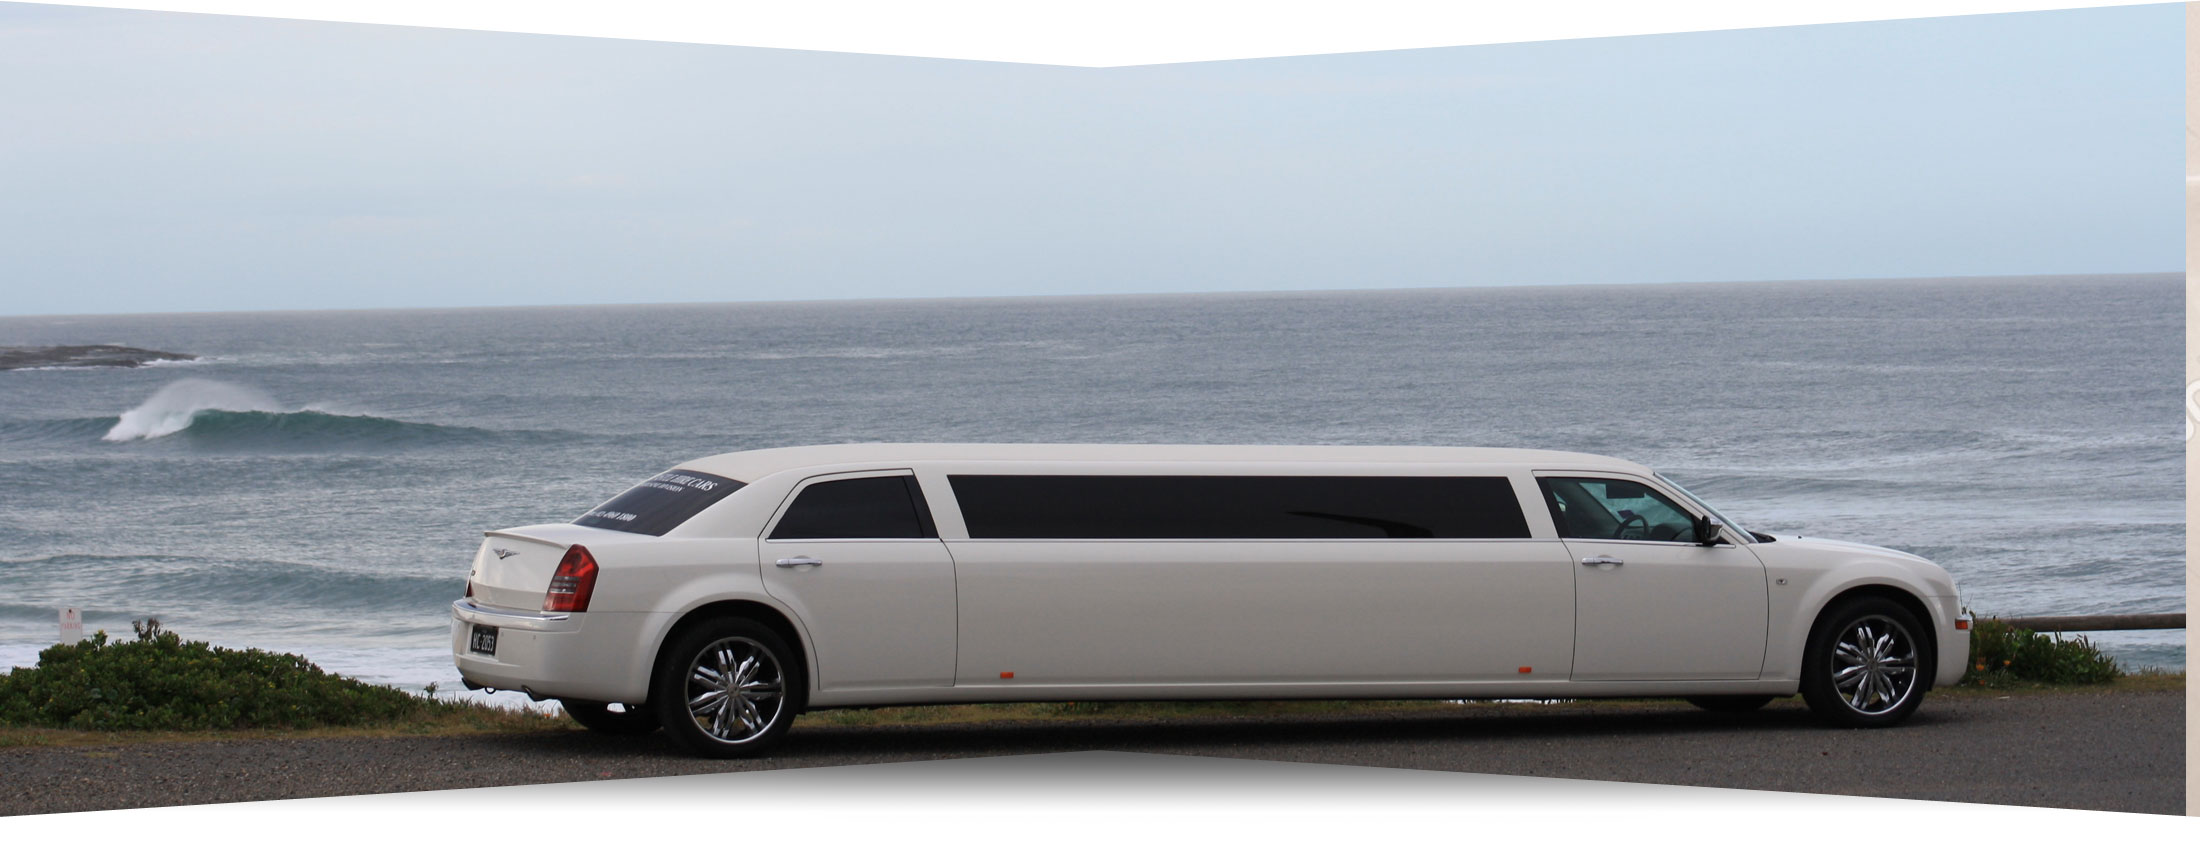 newcastle hire cars chauffeured car stretch limousine